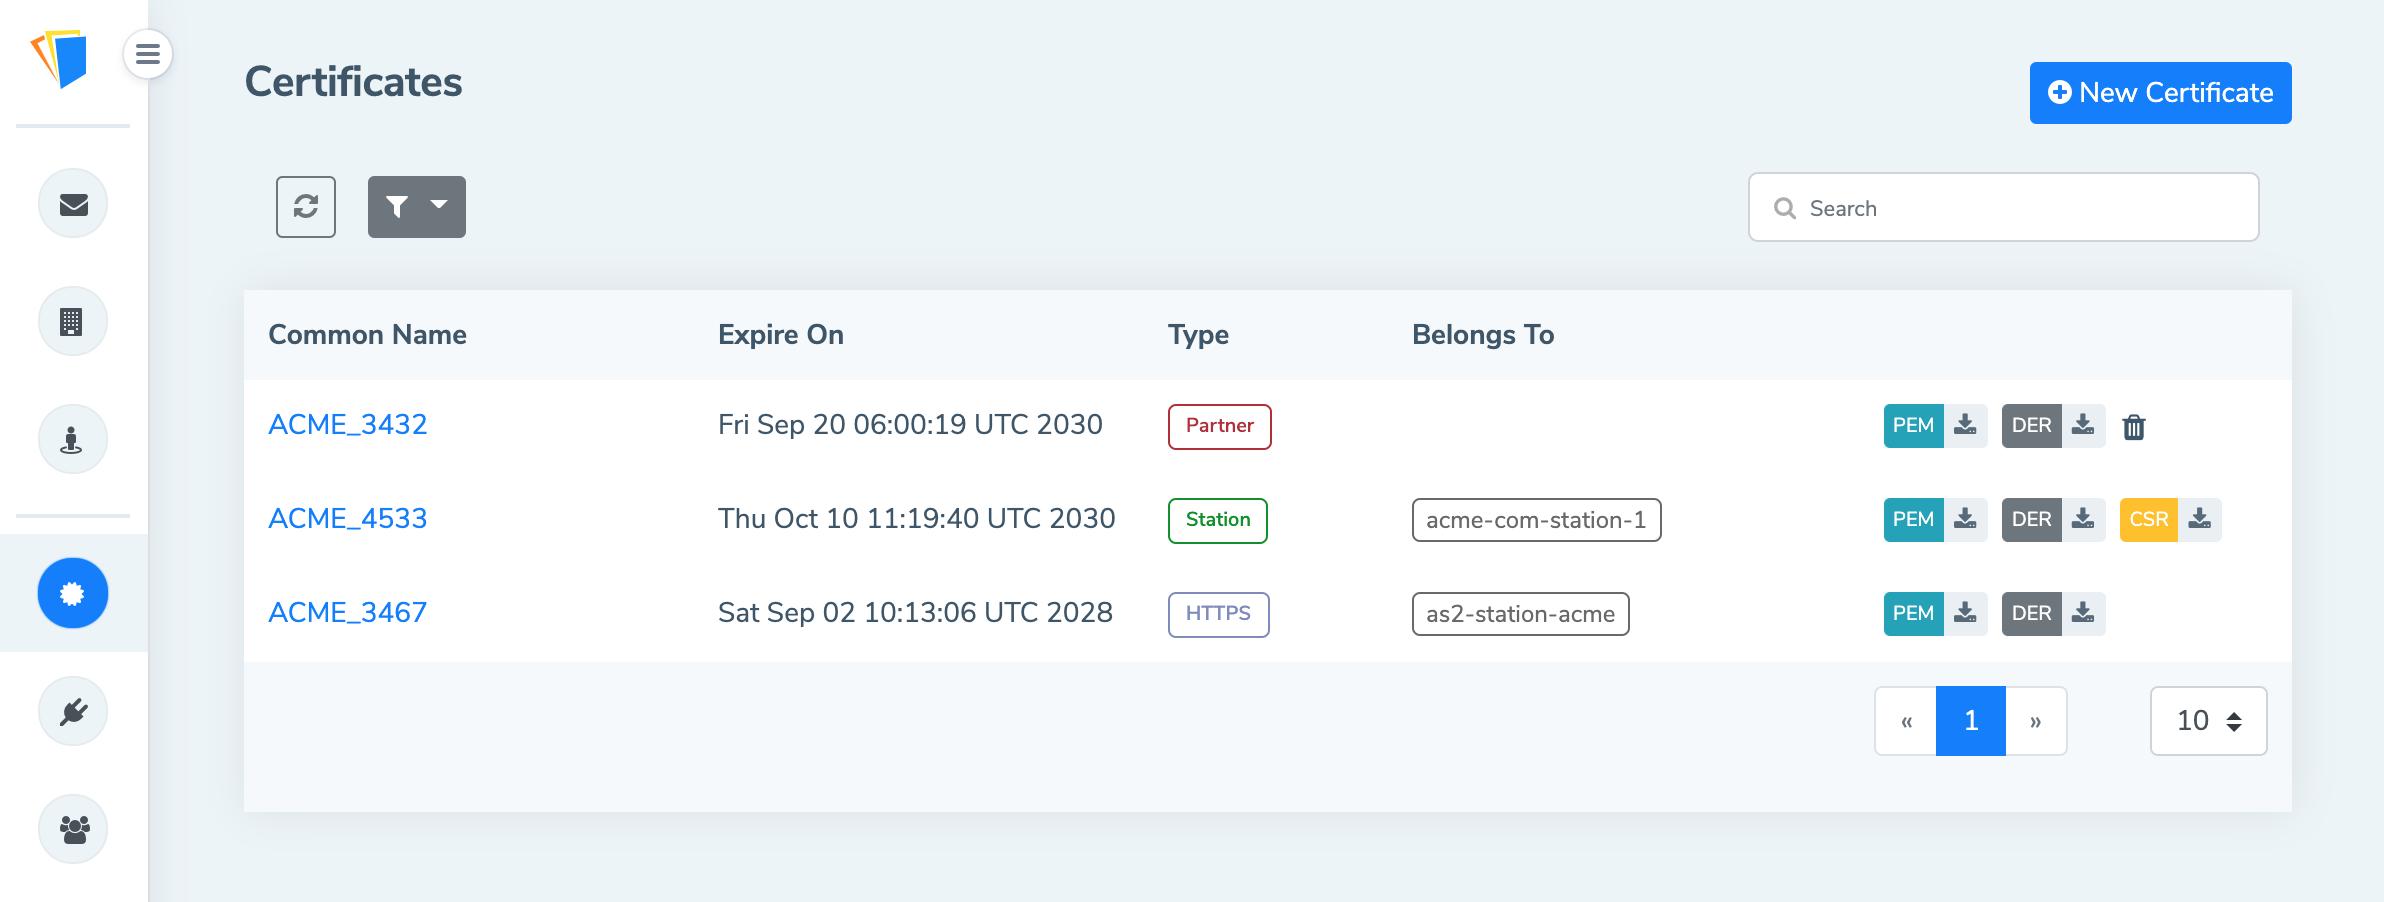 certificate mft webhook integration release certificates manage